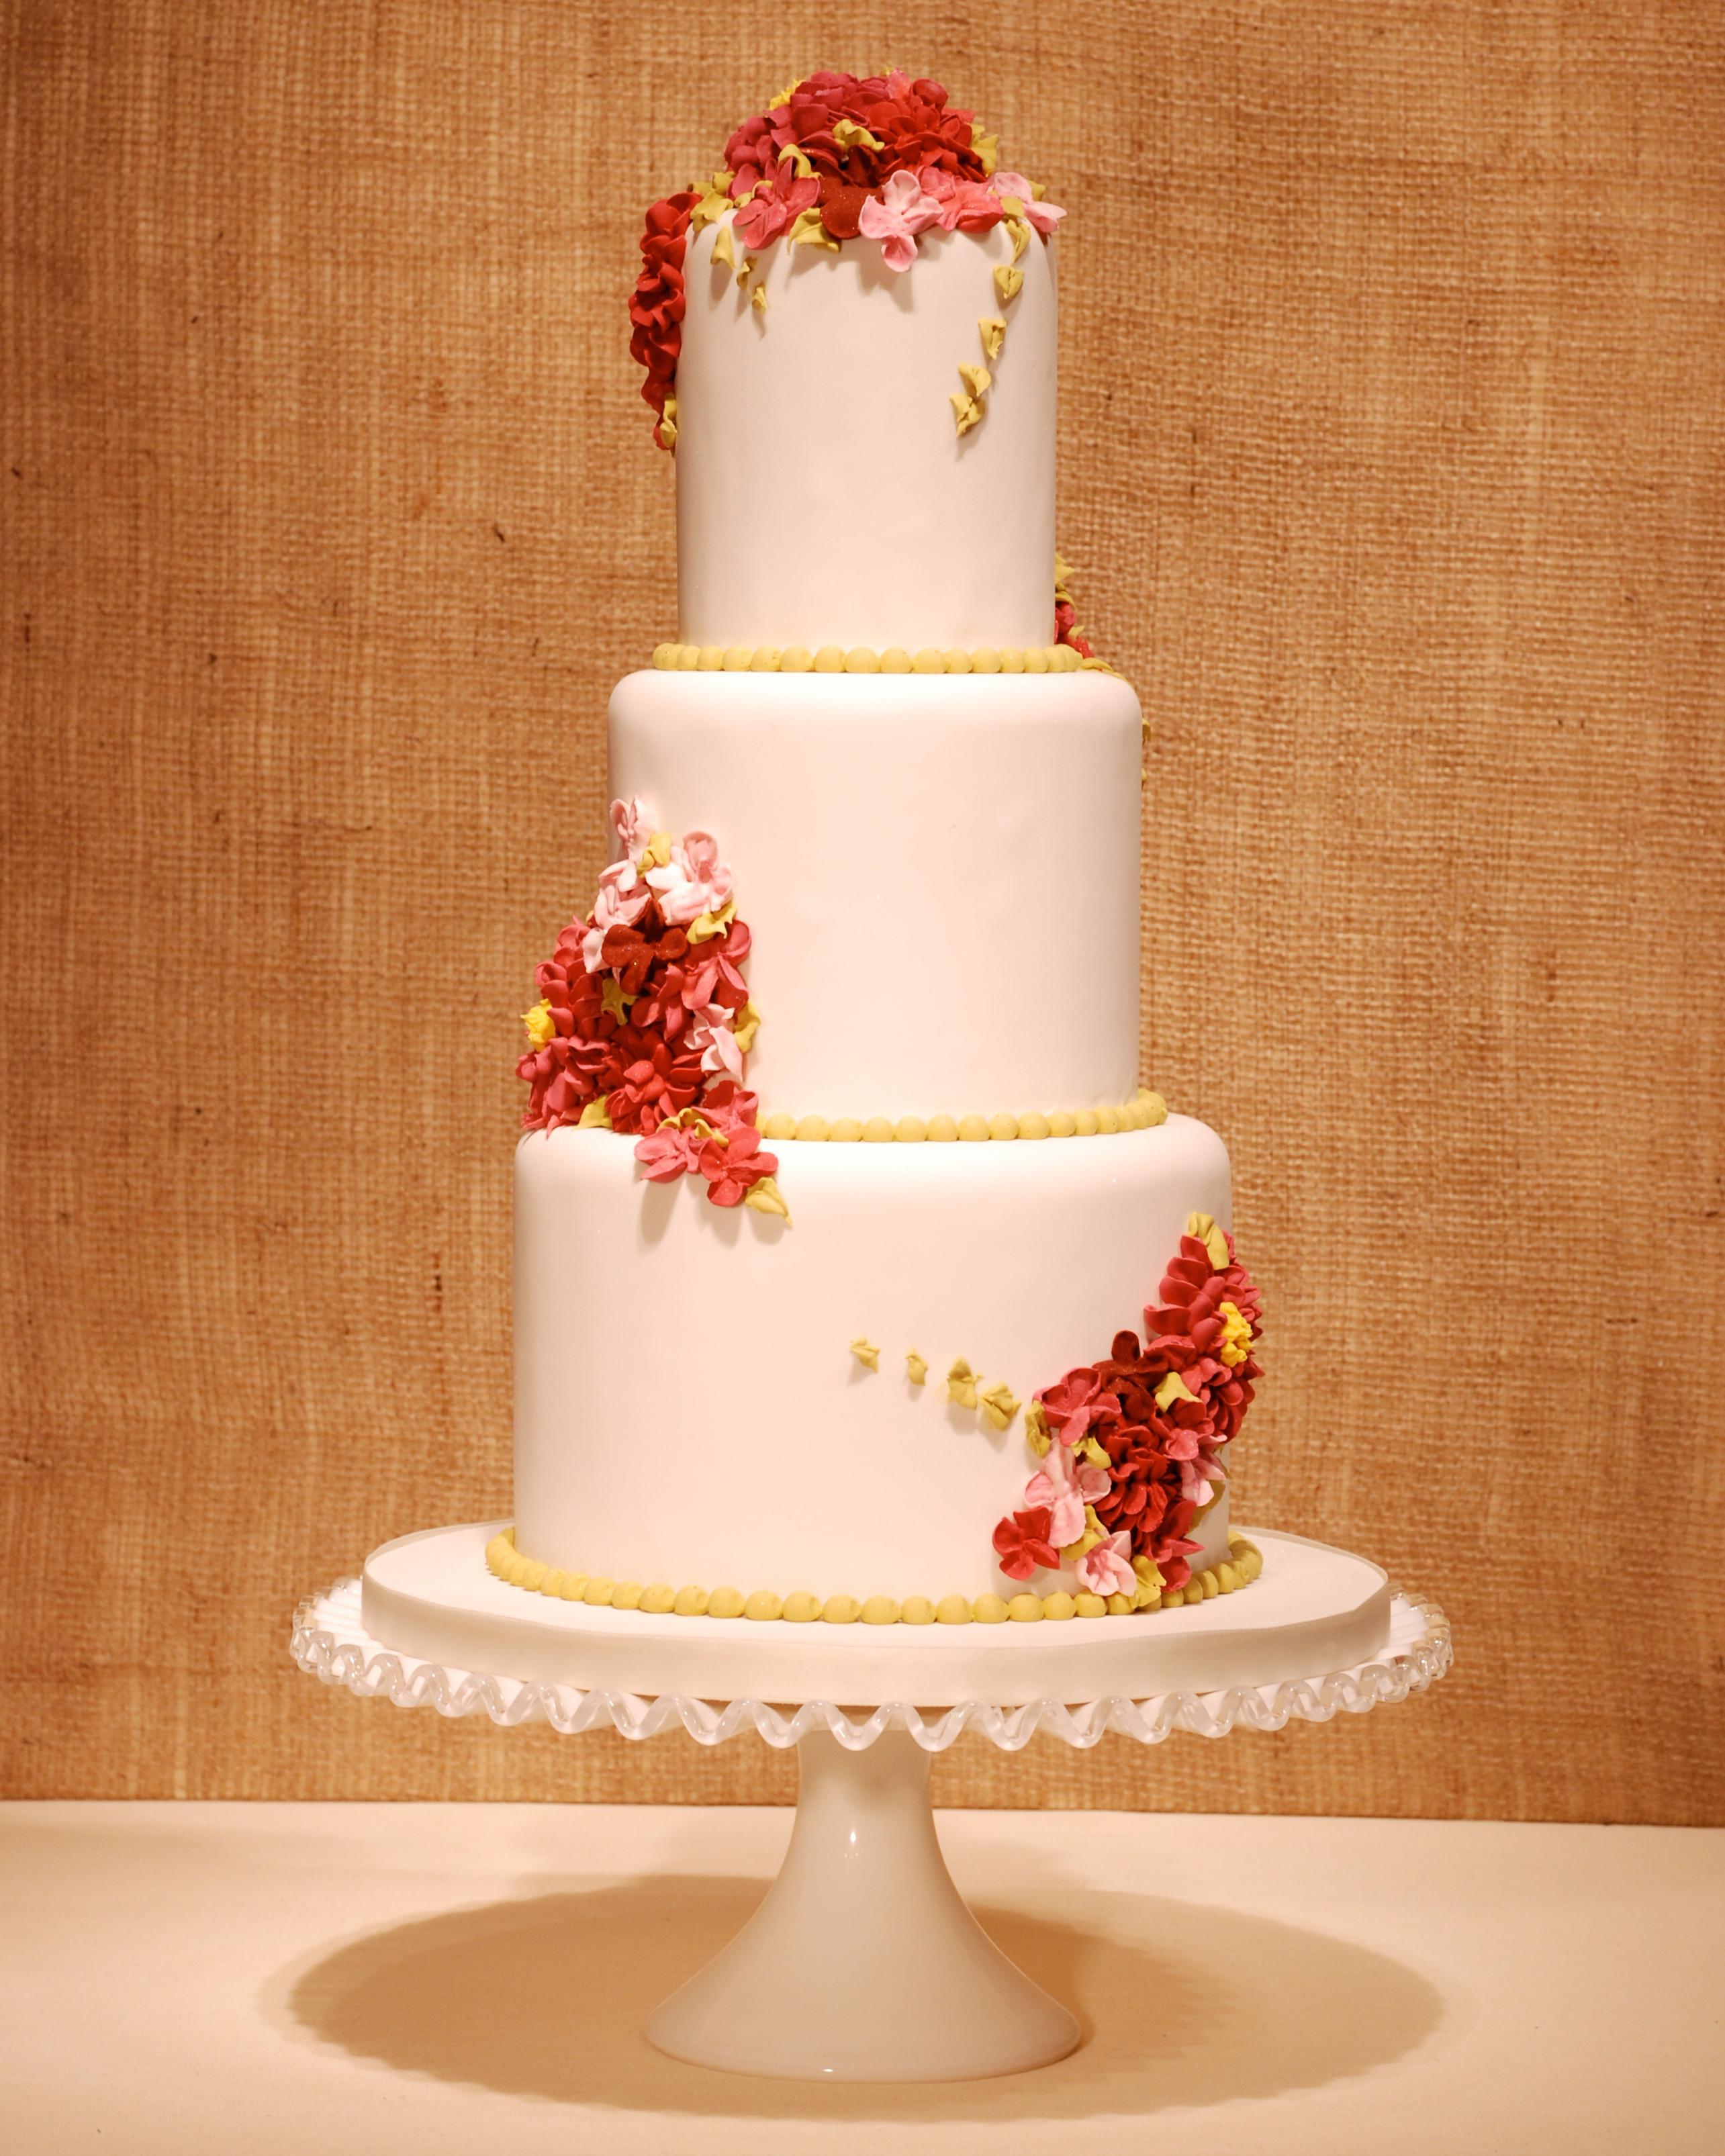 cake-pros-cake-0414.jpg